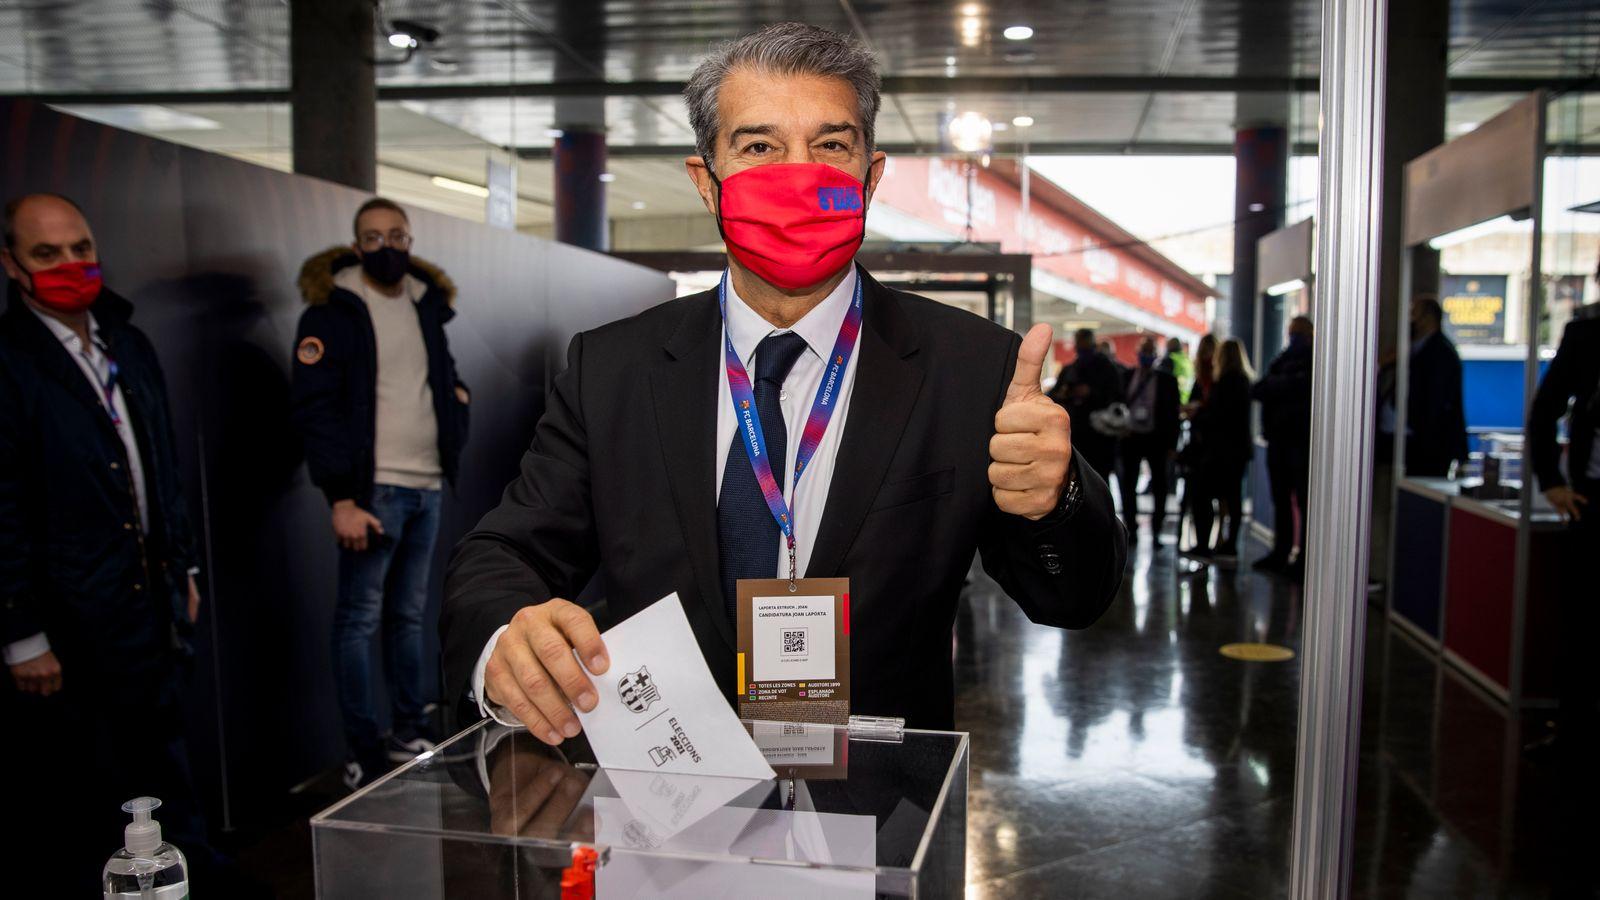 Joan Laporta wins Barcelona presidential election until 2026